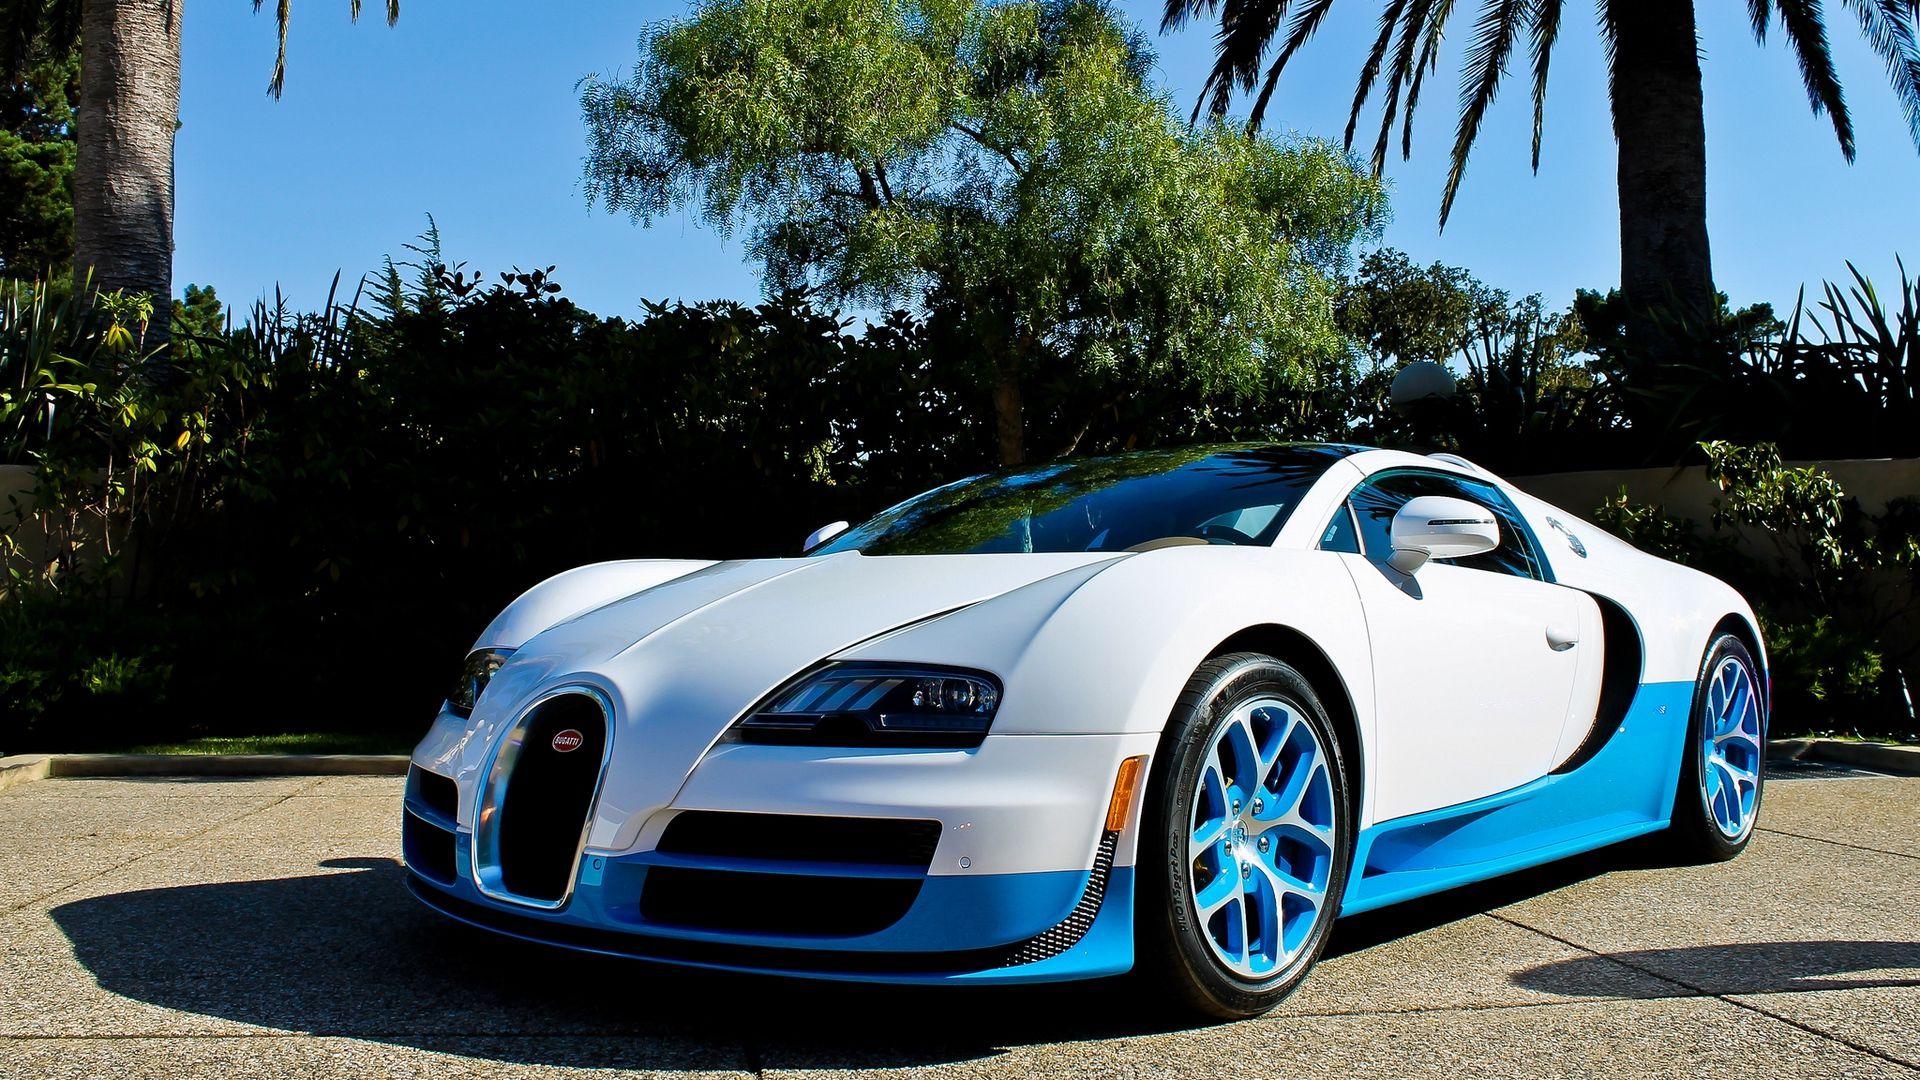 Download Wallpaper 1920x1080 Bugatti Veyron Vitesse Blue Palm Trees Full Hd Hdtv Fhd 1080p Hd Background Bugatti Veyron Vitesse Bugatti Veyron Bugatti